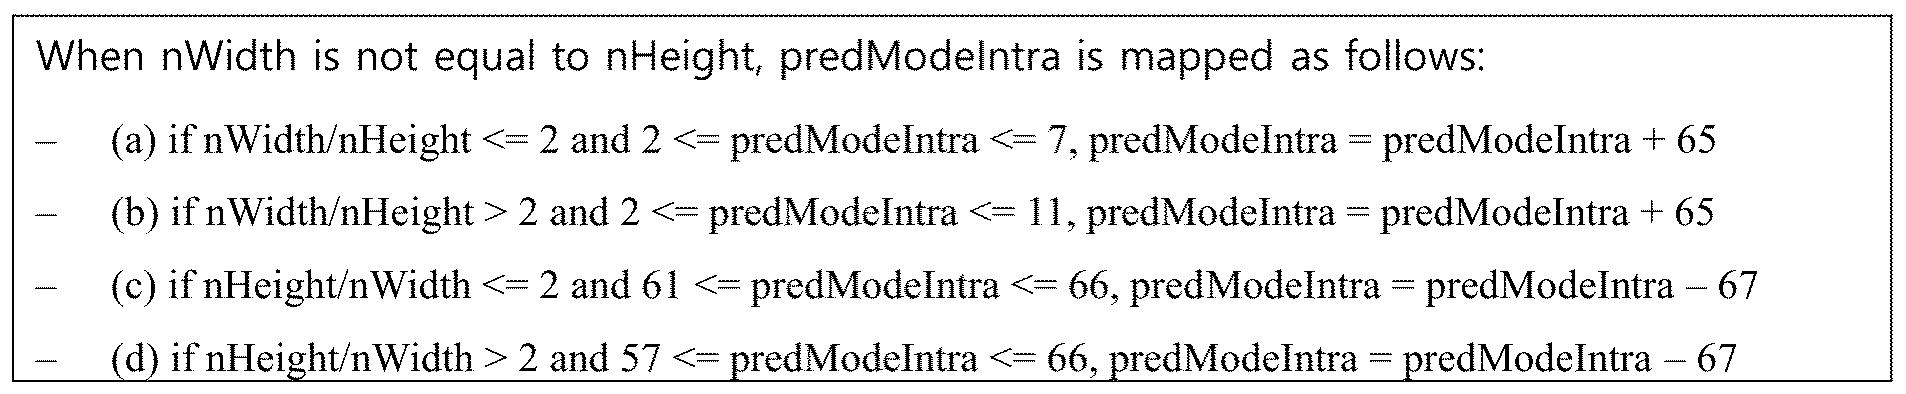 Figure PCTKR2019018117-appb-img-000007